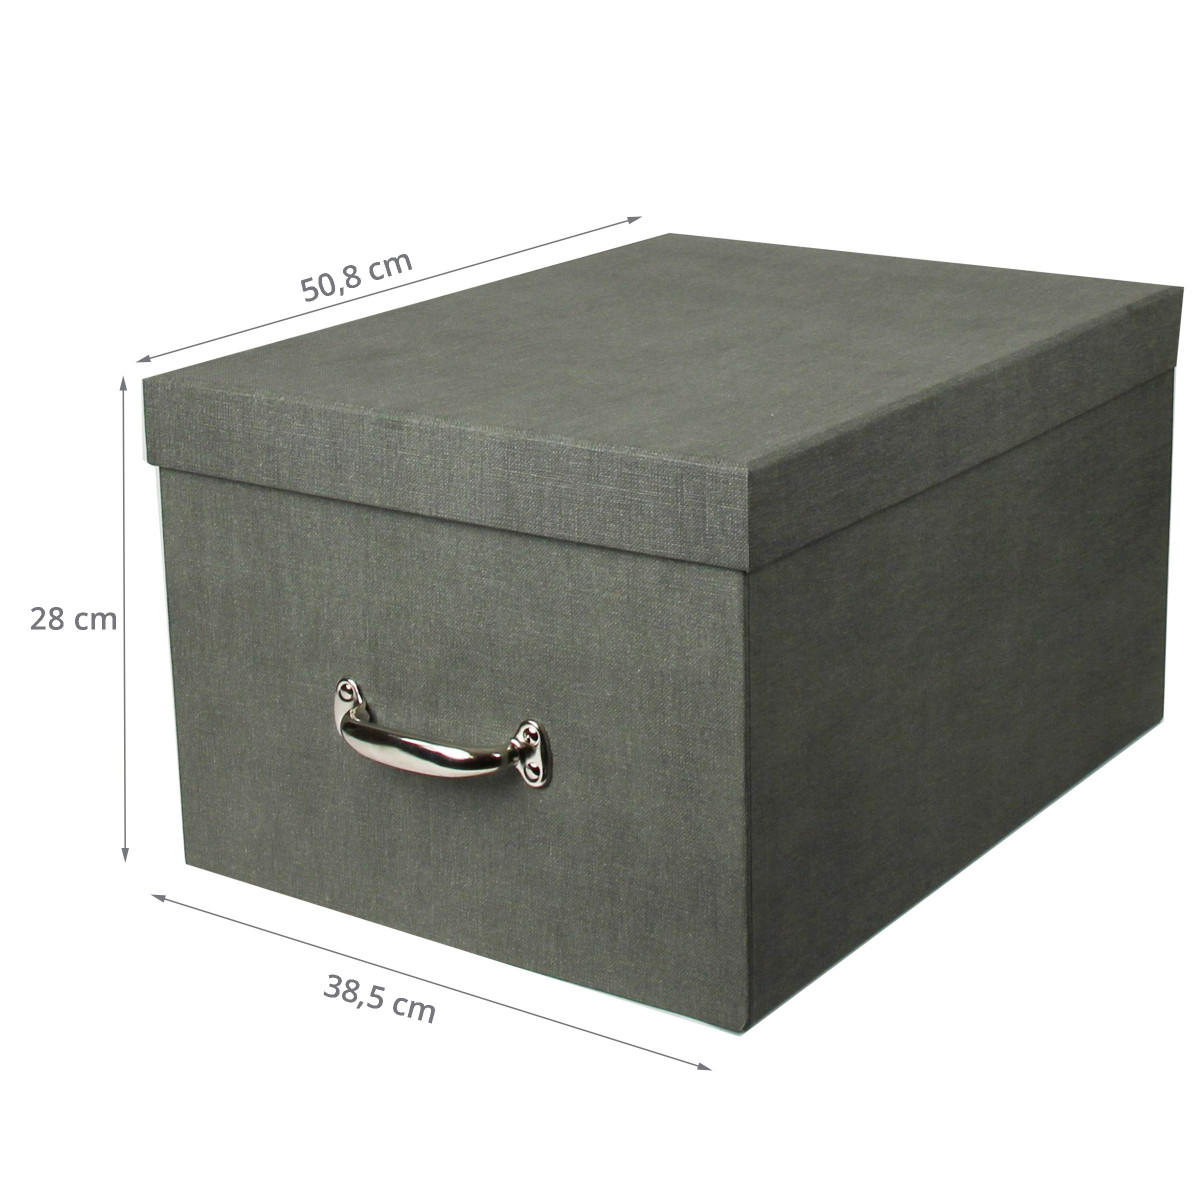 grande bo te de rangement en carton gris solide et l gante. Black Bedroom Furniture Sets. Home Design Ideas